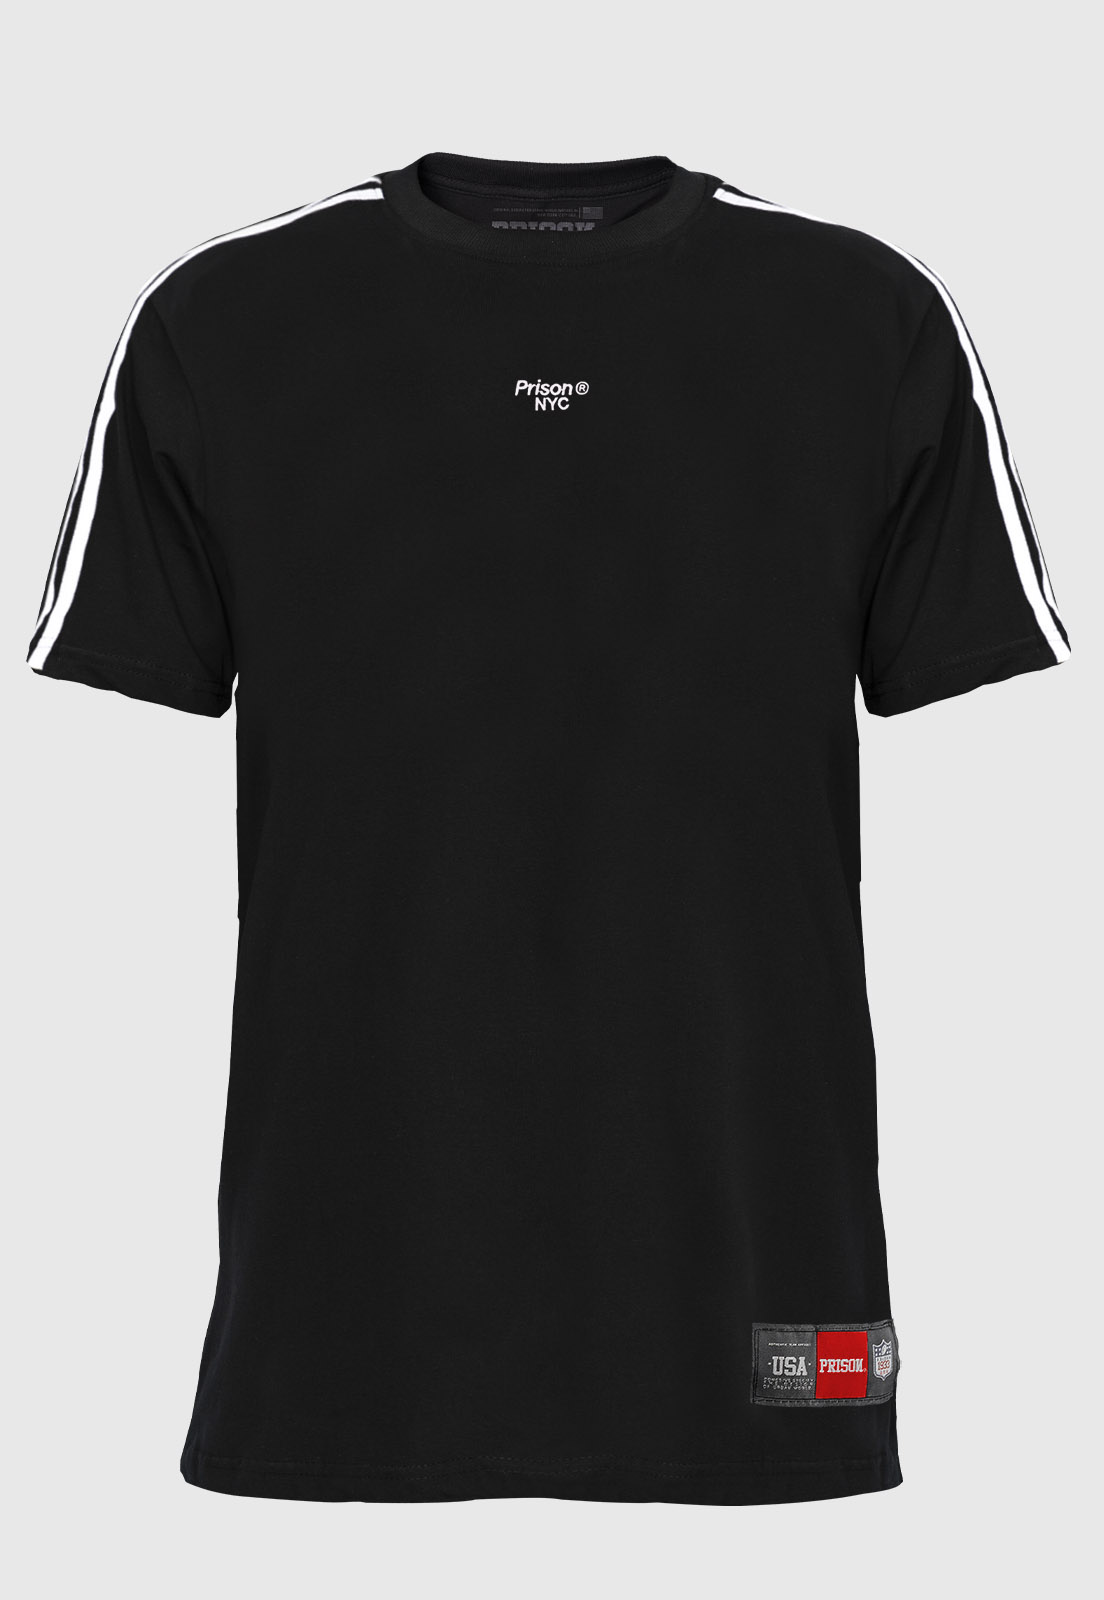 Camiseta Prison NYC Double Listrada Preta